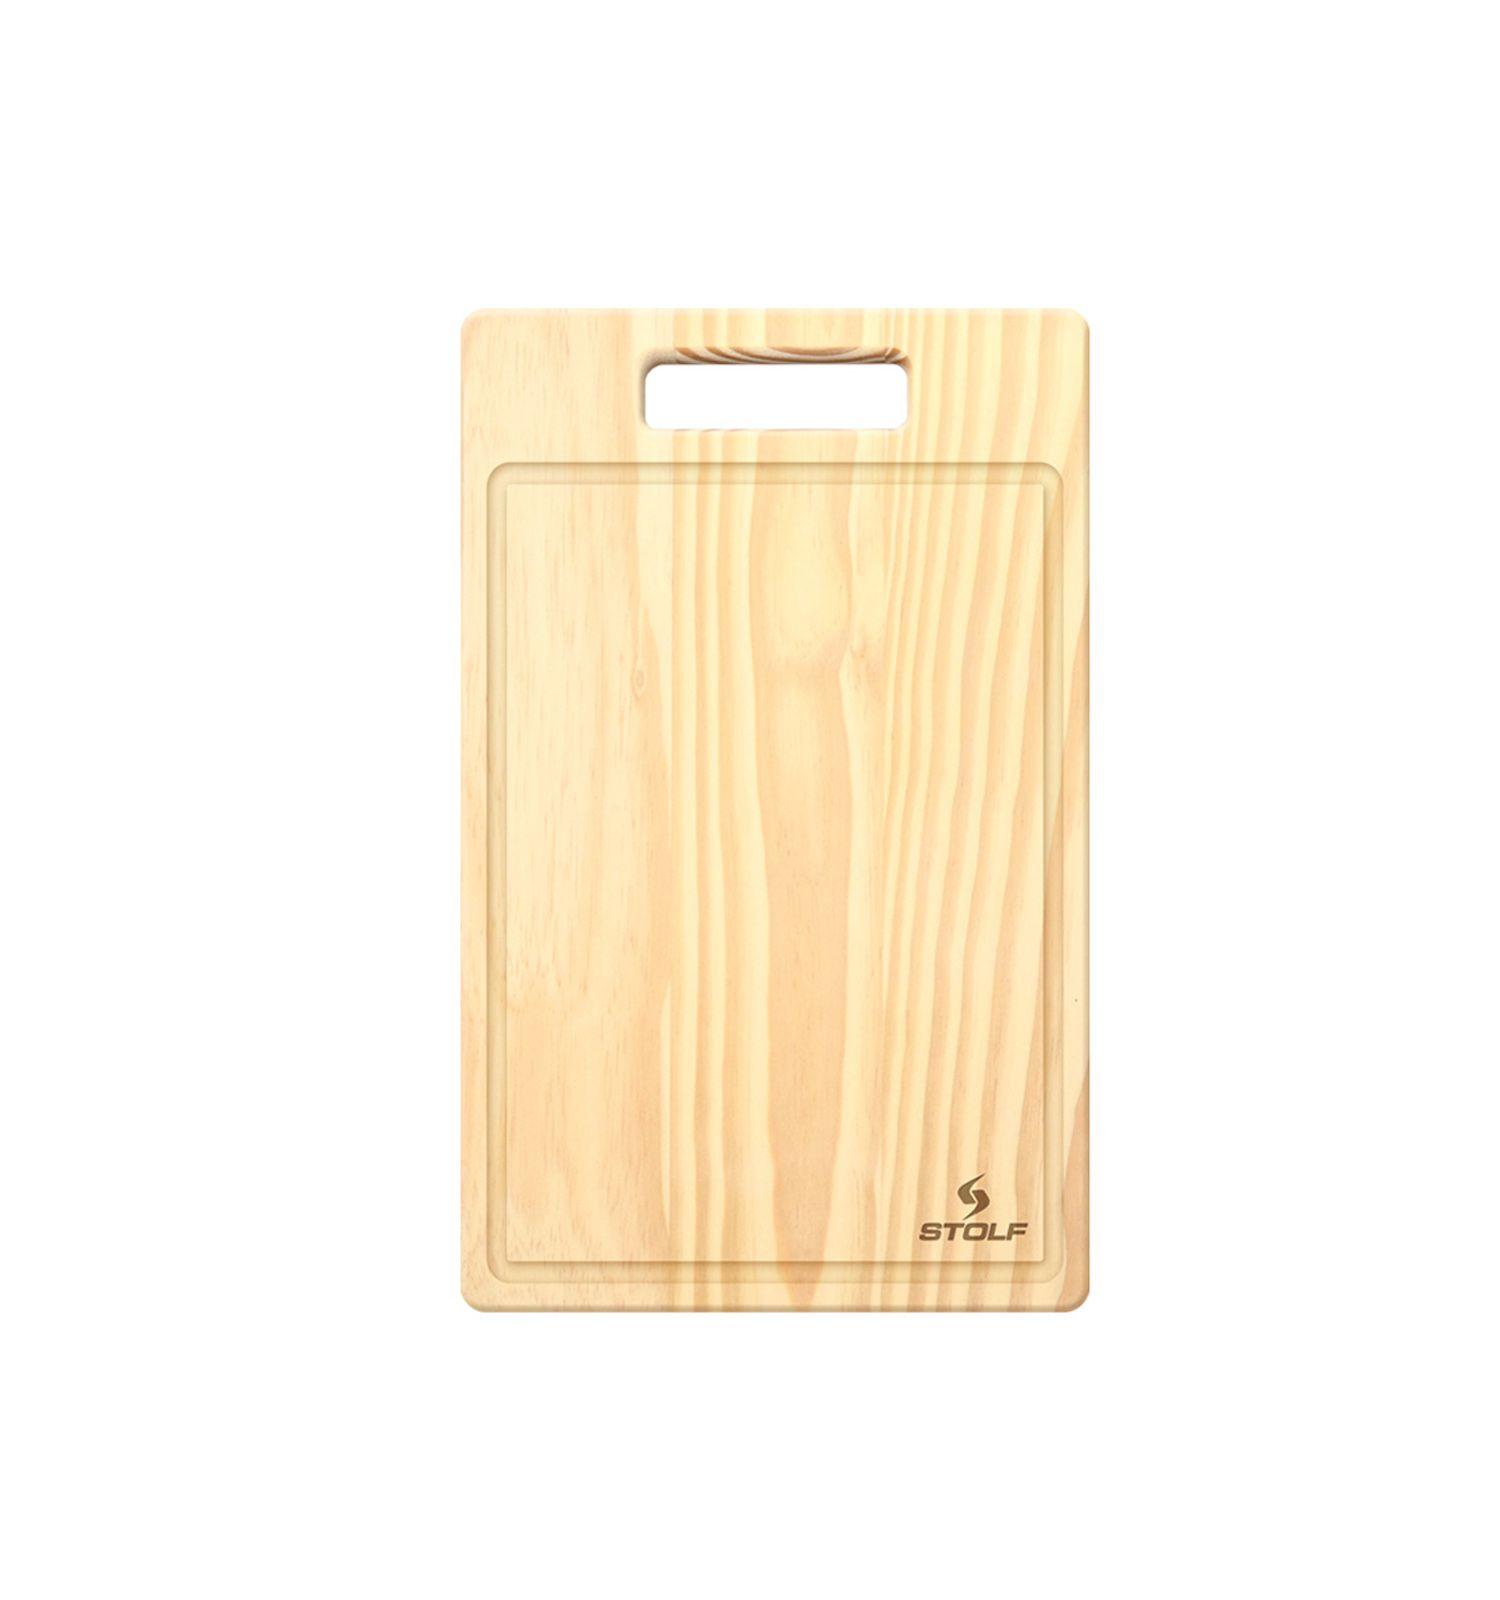 Tabua de Carne Pinus com Canaleta 44x30